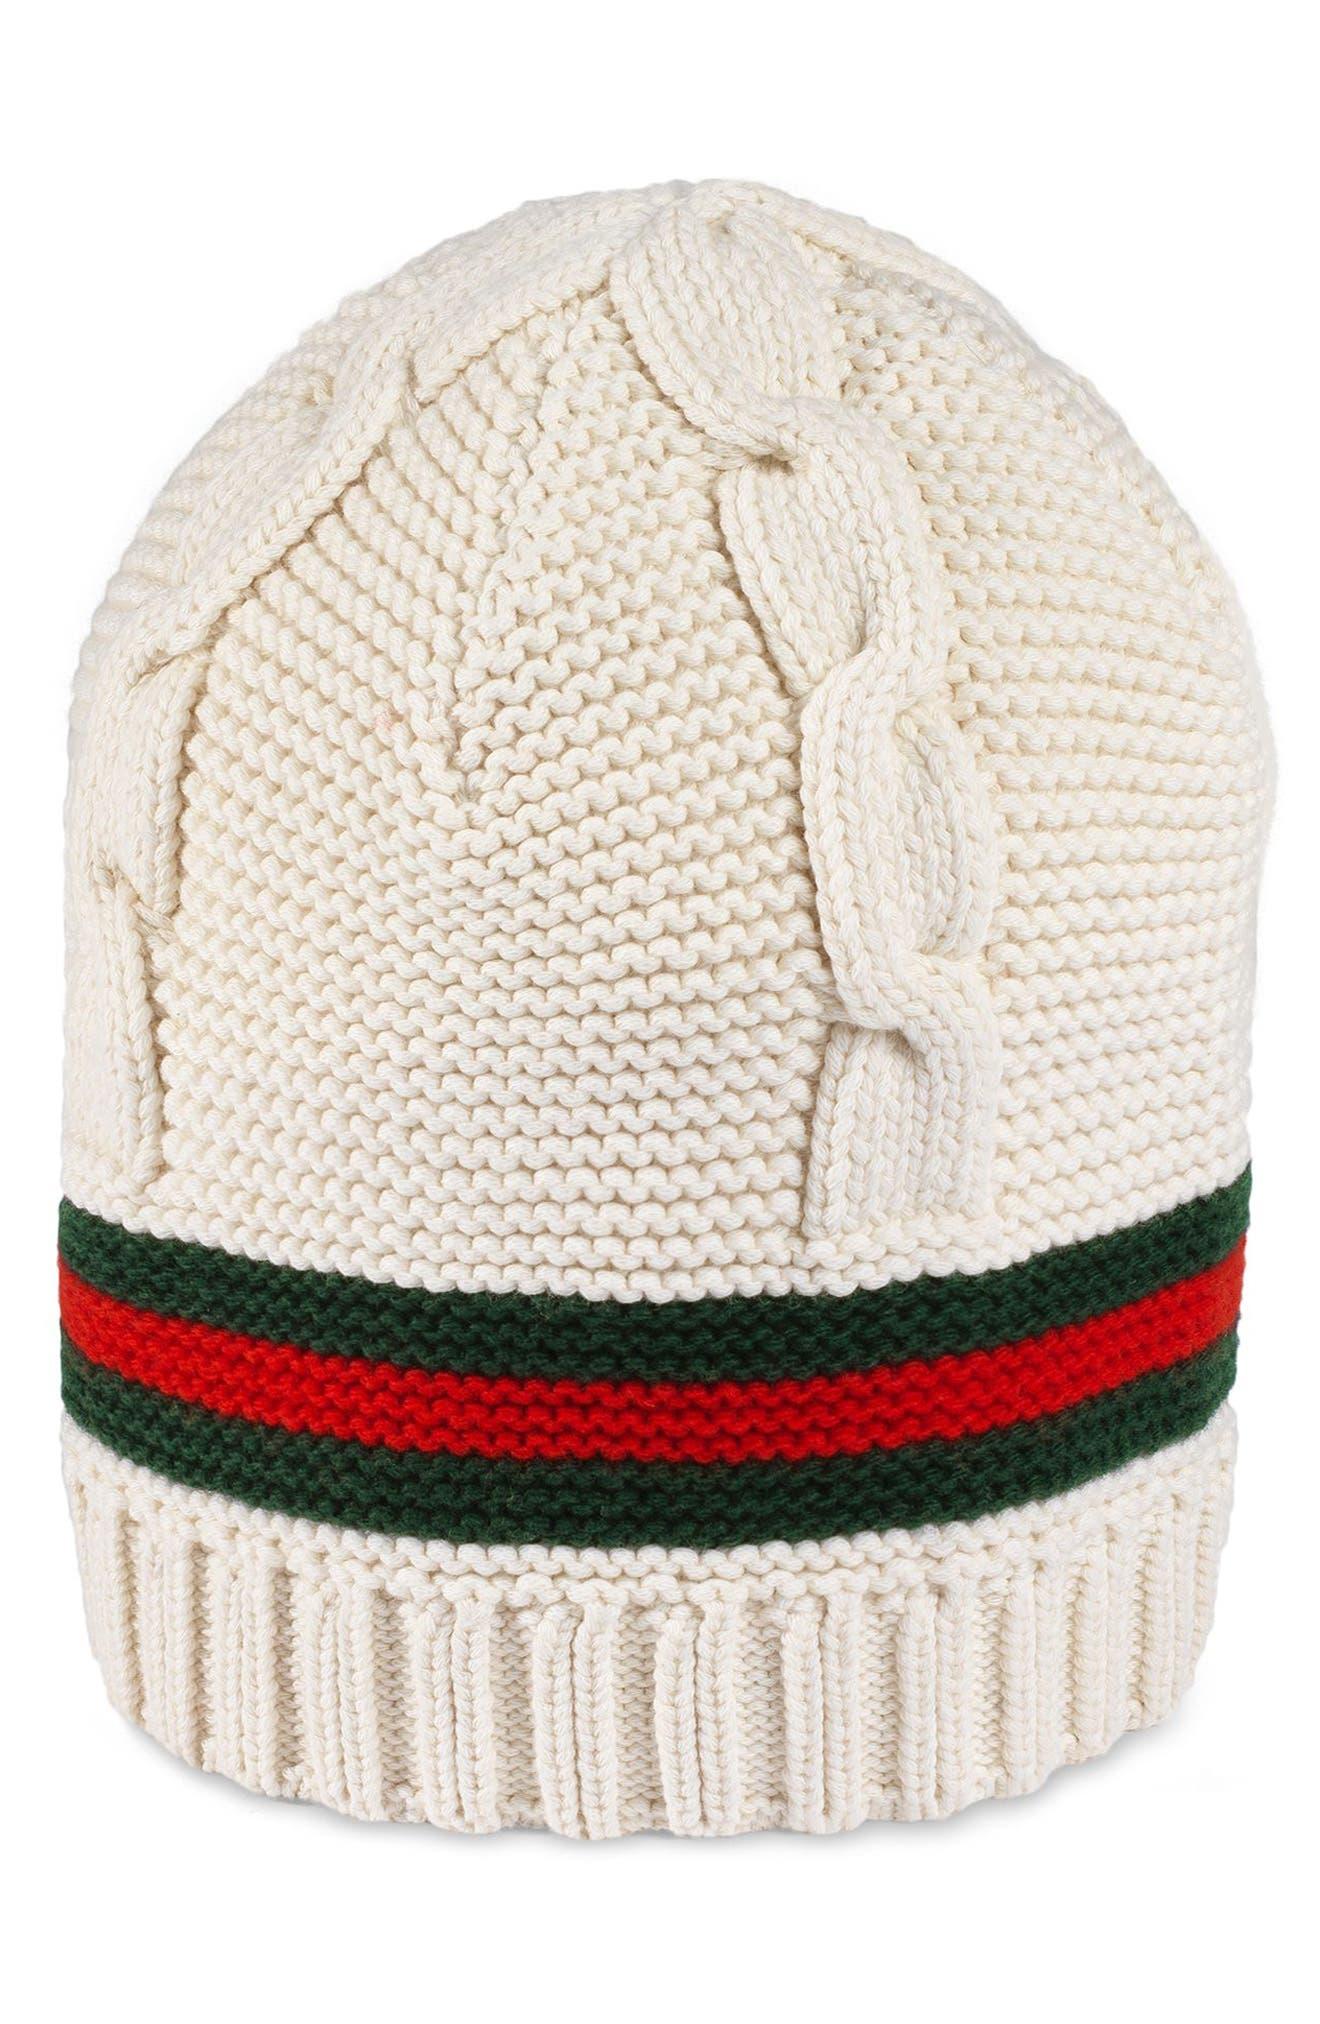 Liom Cable Knit Beanie,                             Main thumbnail 1, color,                             White/ Dark Green